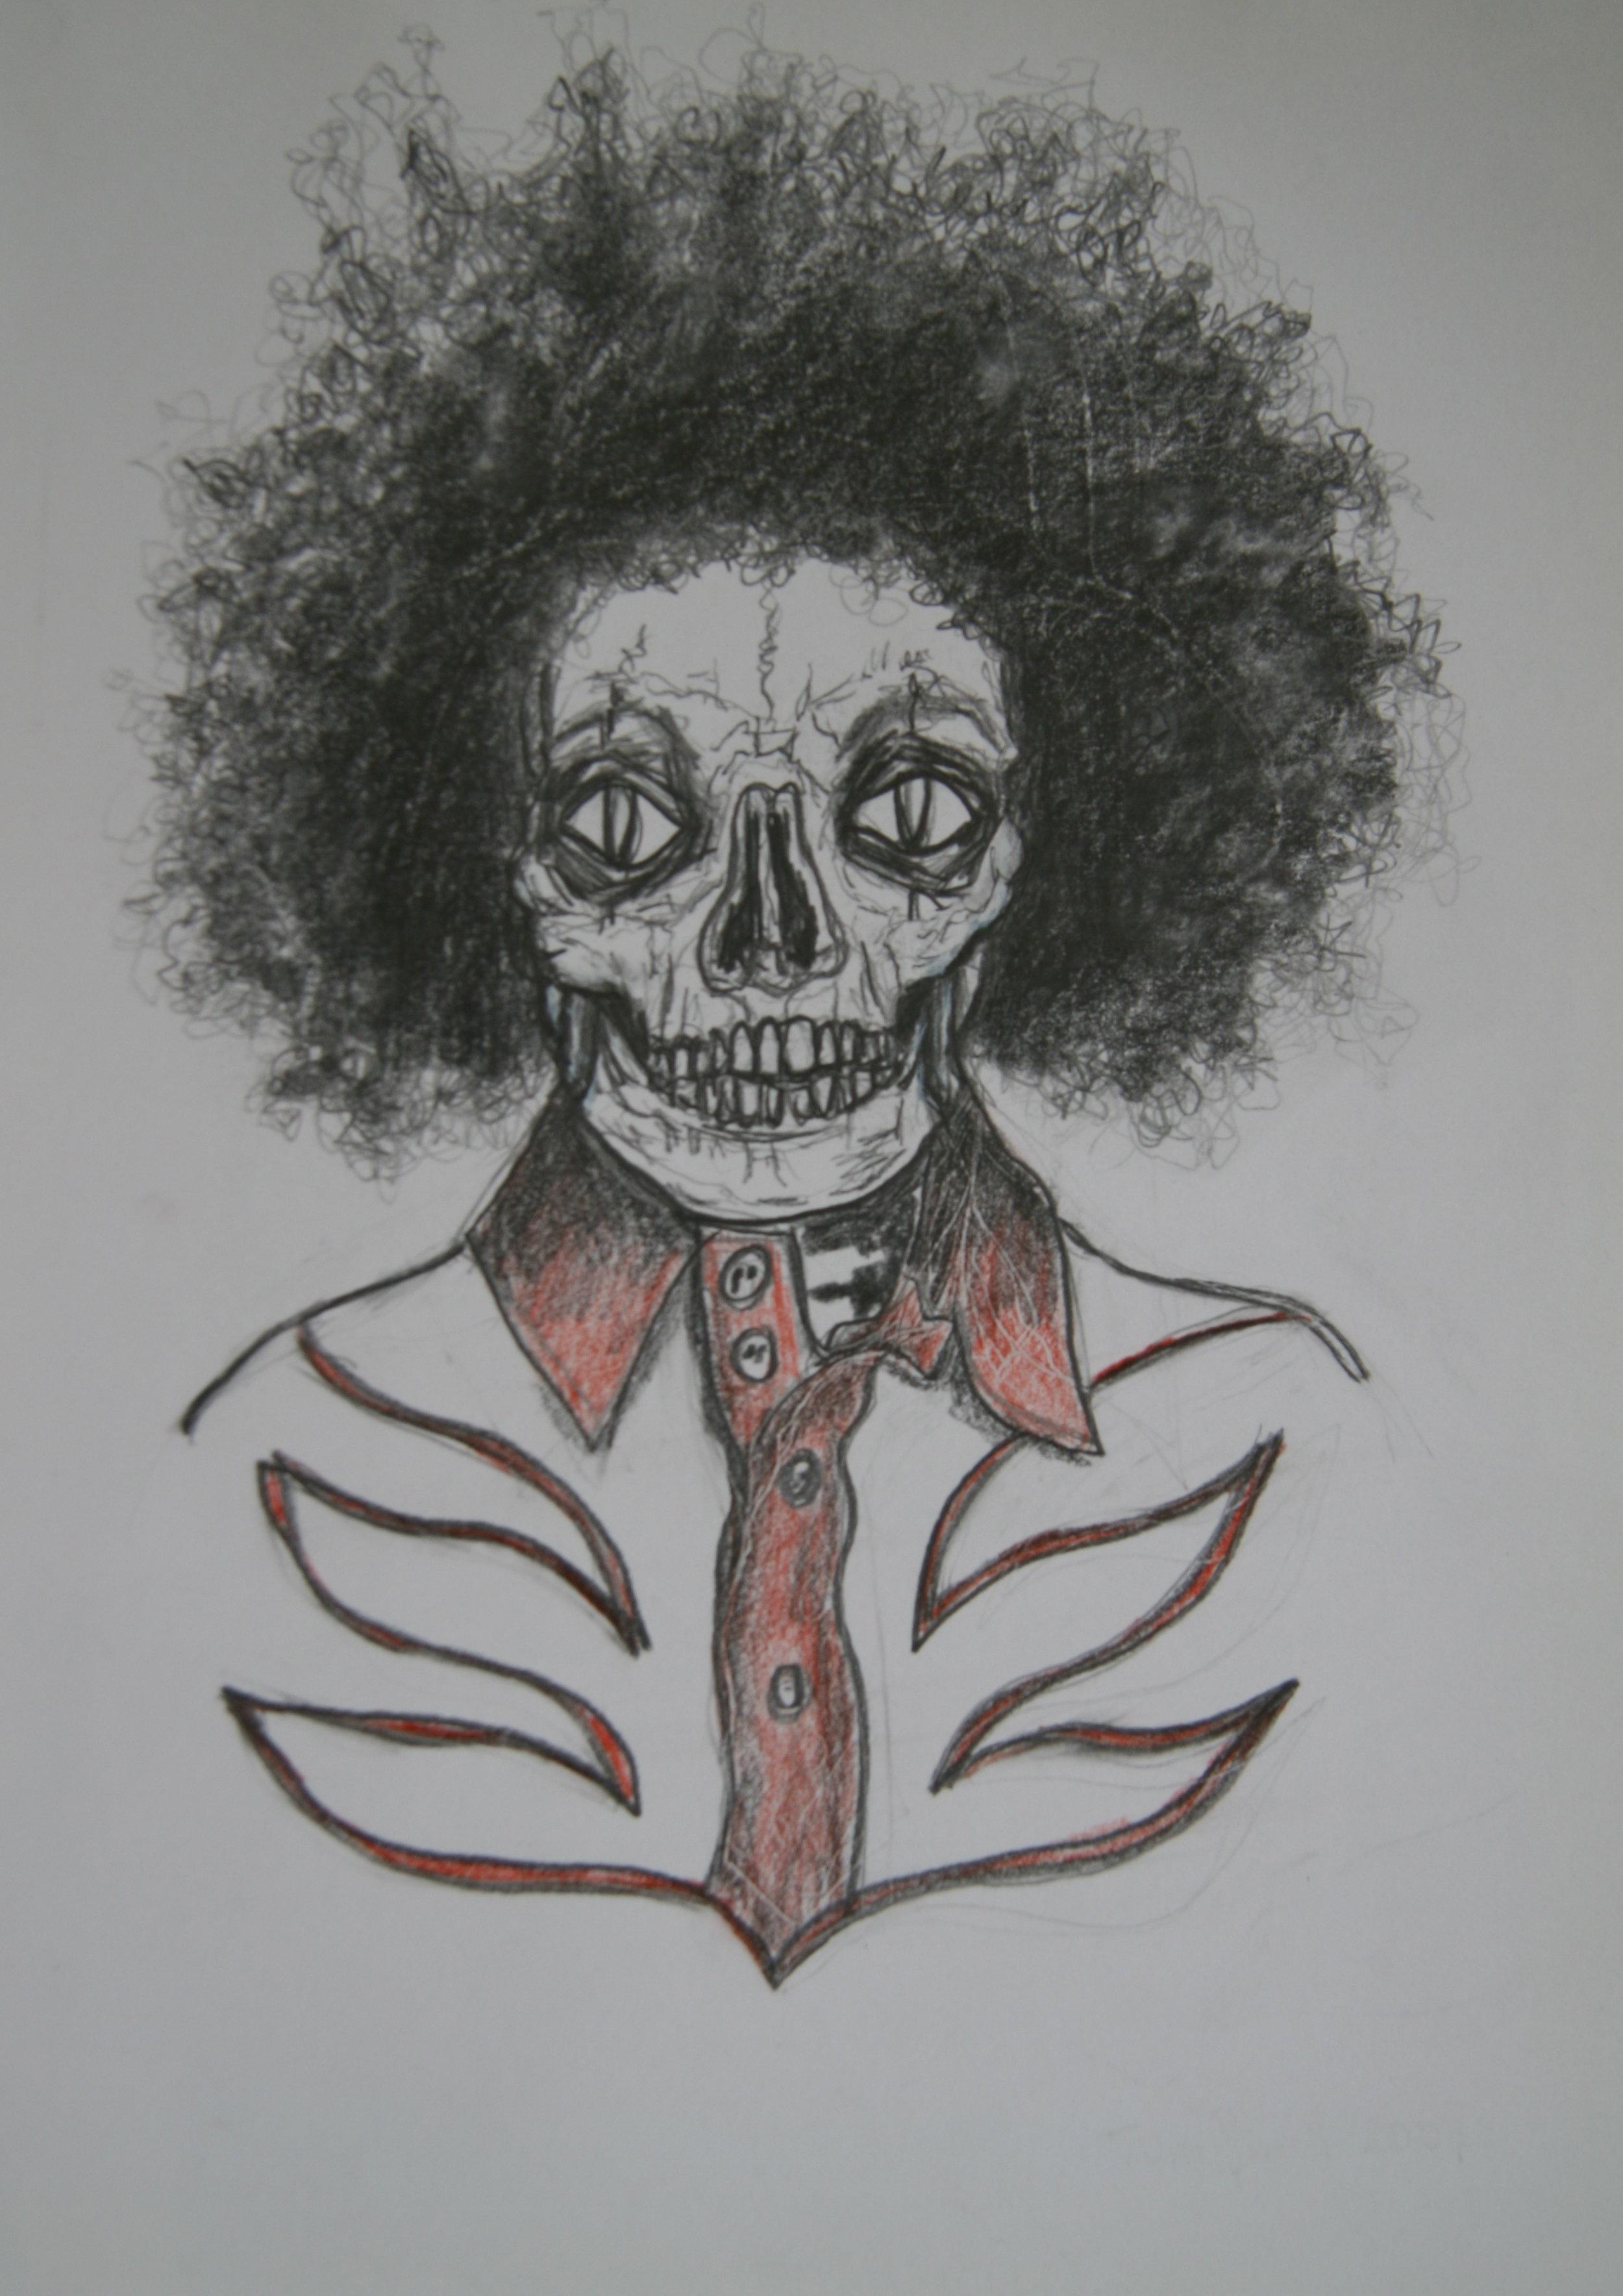 Skull 3, 30x21cm, pencil on paper